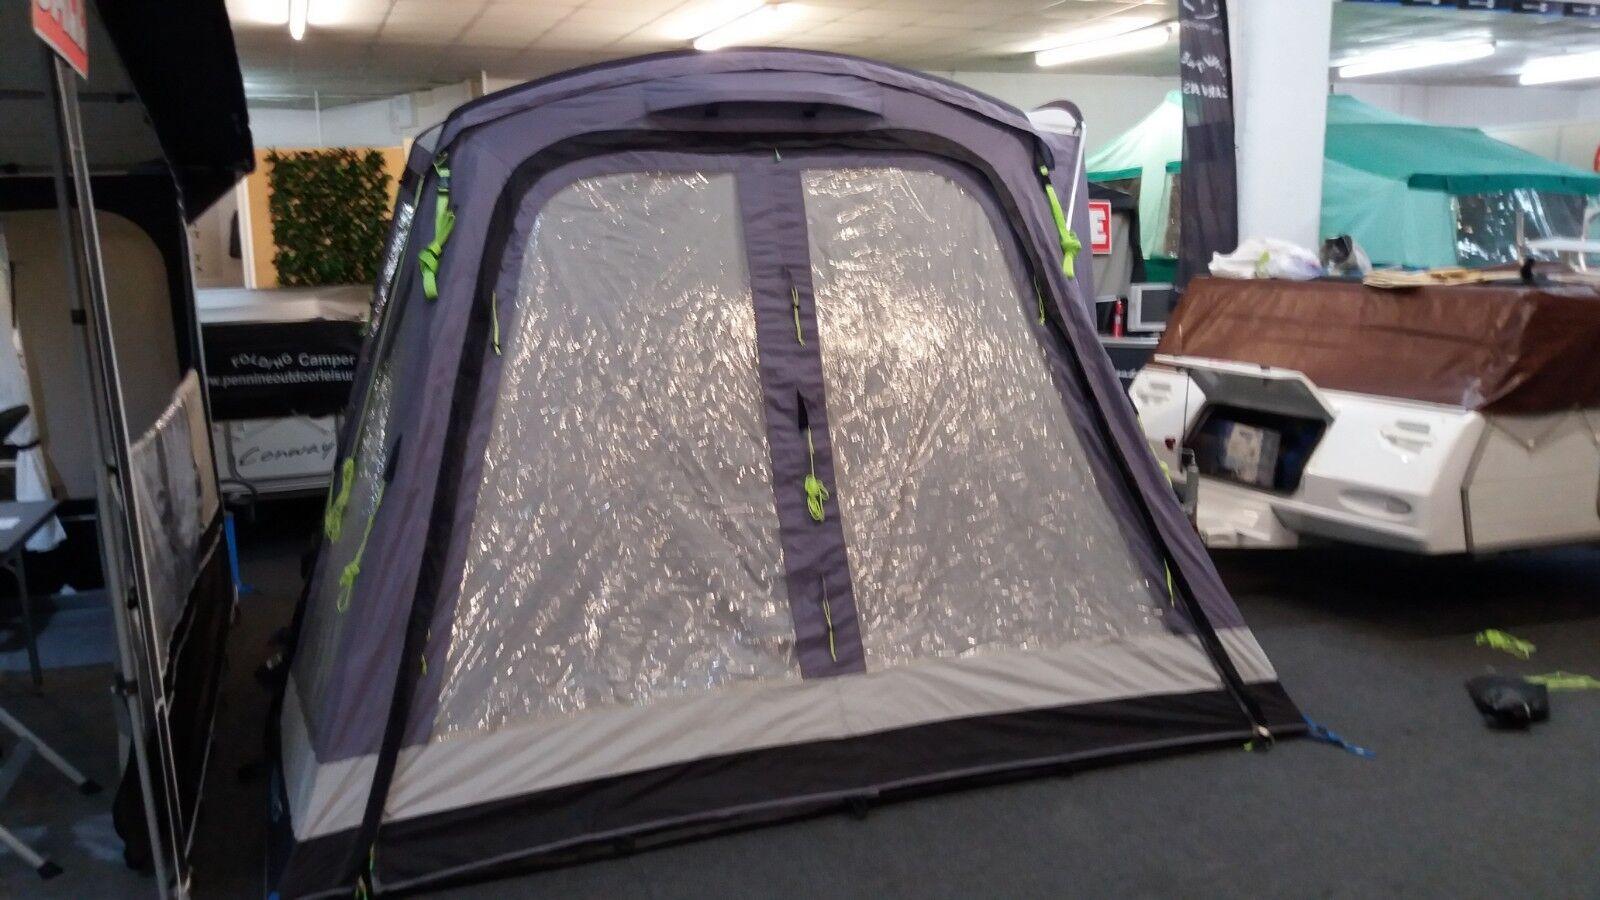 Kampa Travel Pod Motion AIR VW Driveaway Awning - Inc. Footprint - Ex Display